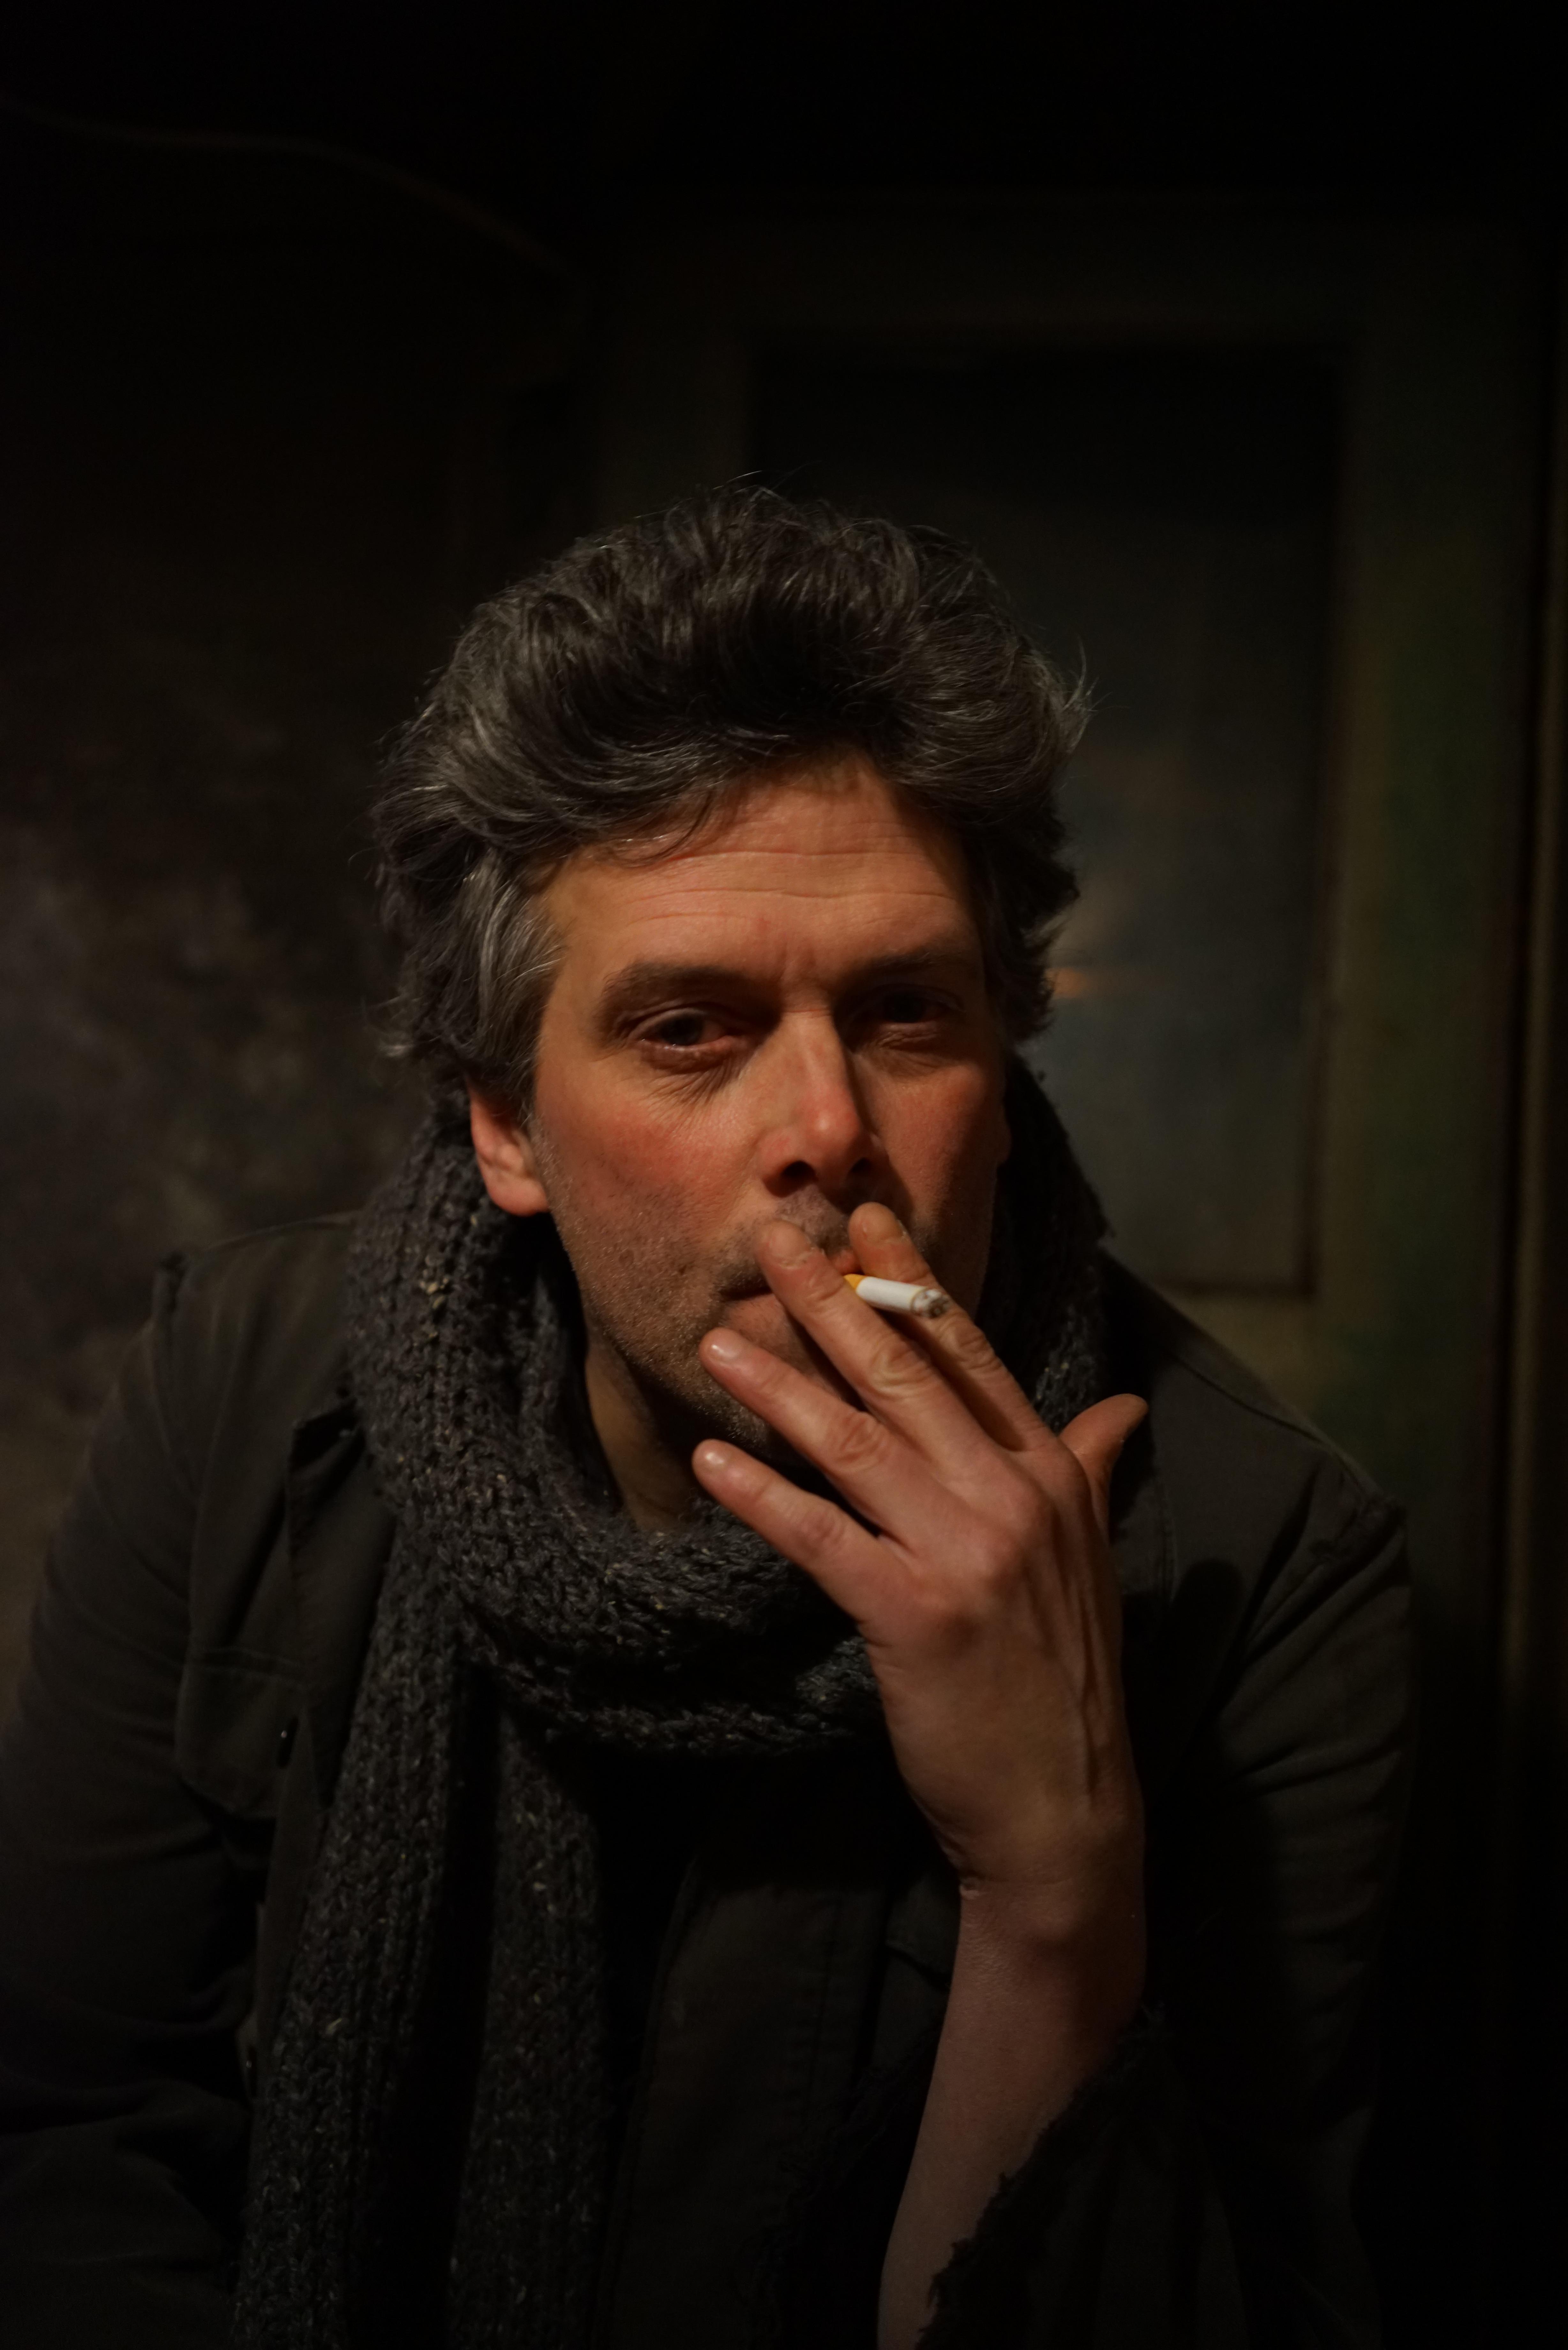 Man In Black Jacket With Gray Knit Scarf Smoking 183 Free